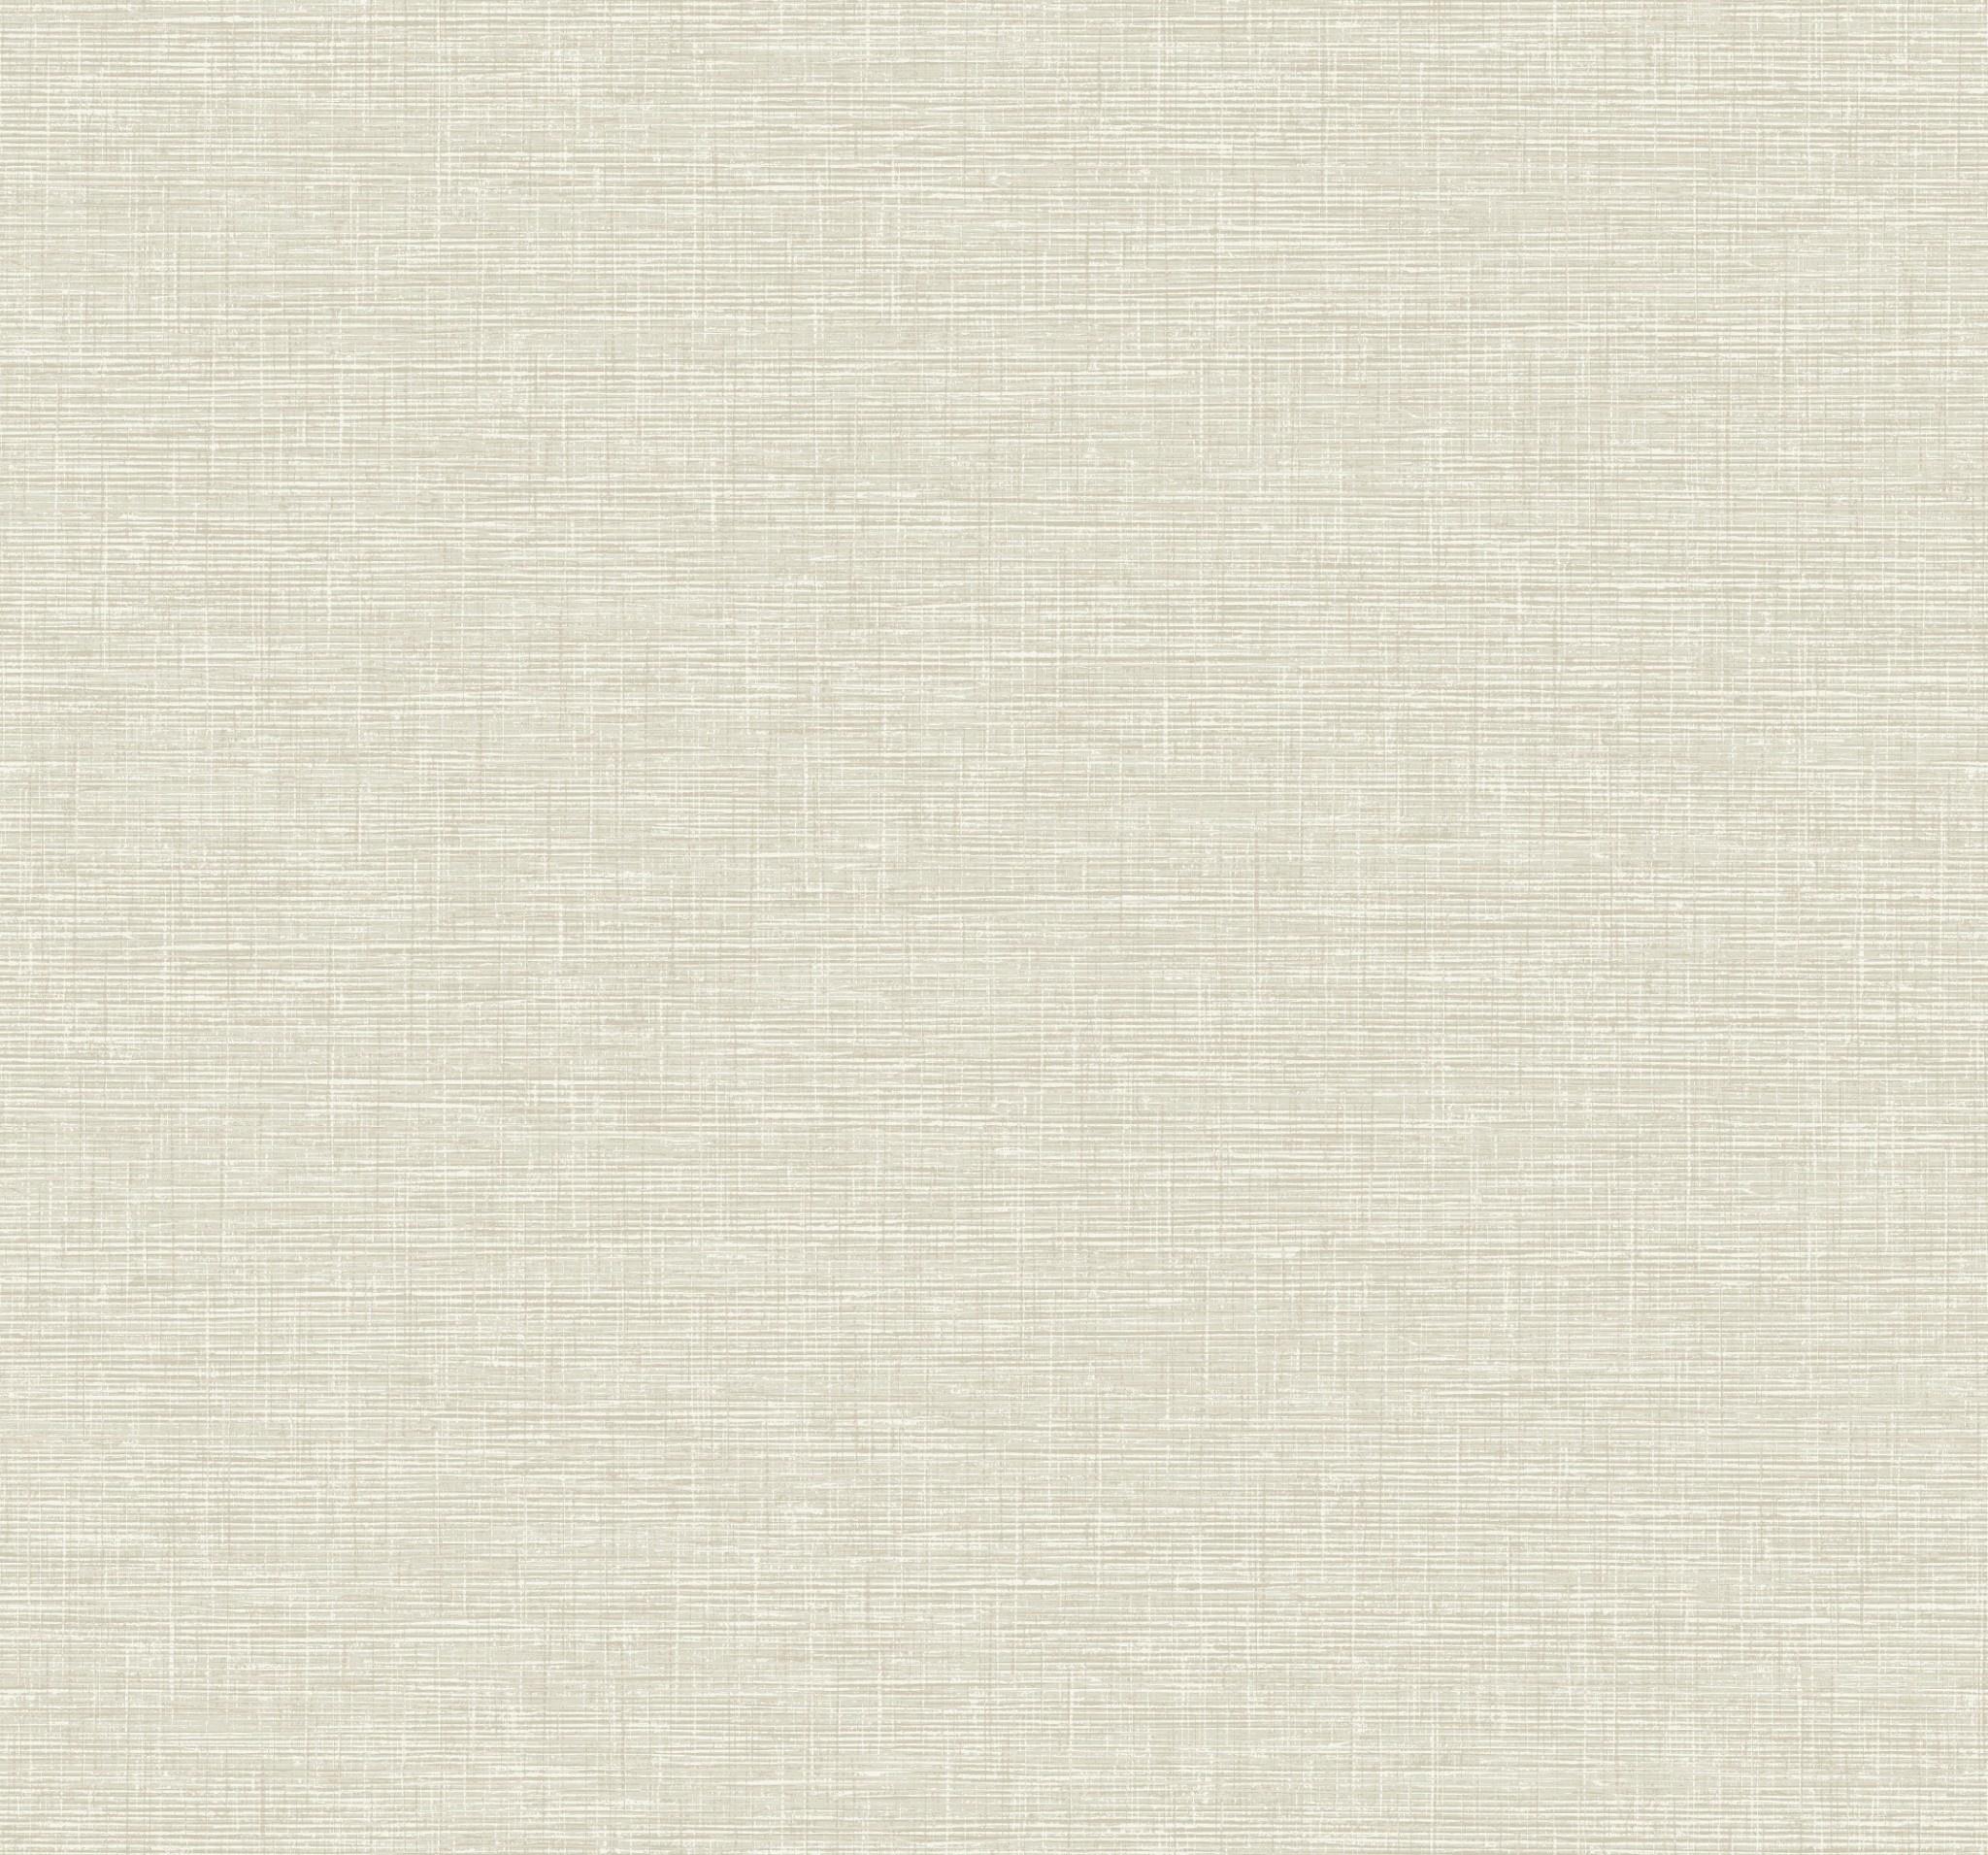 Wallquest Linen Weave